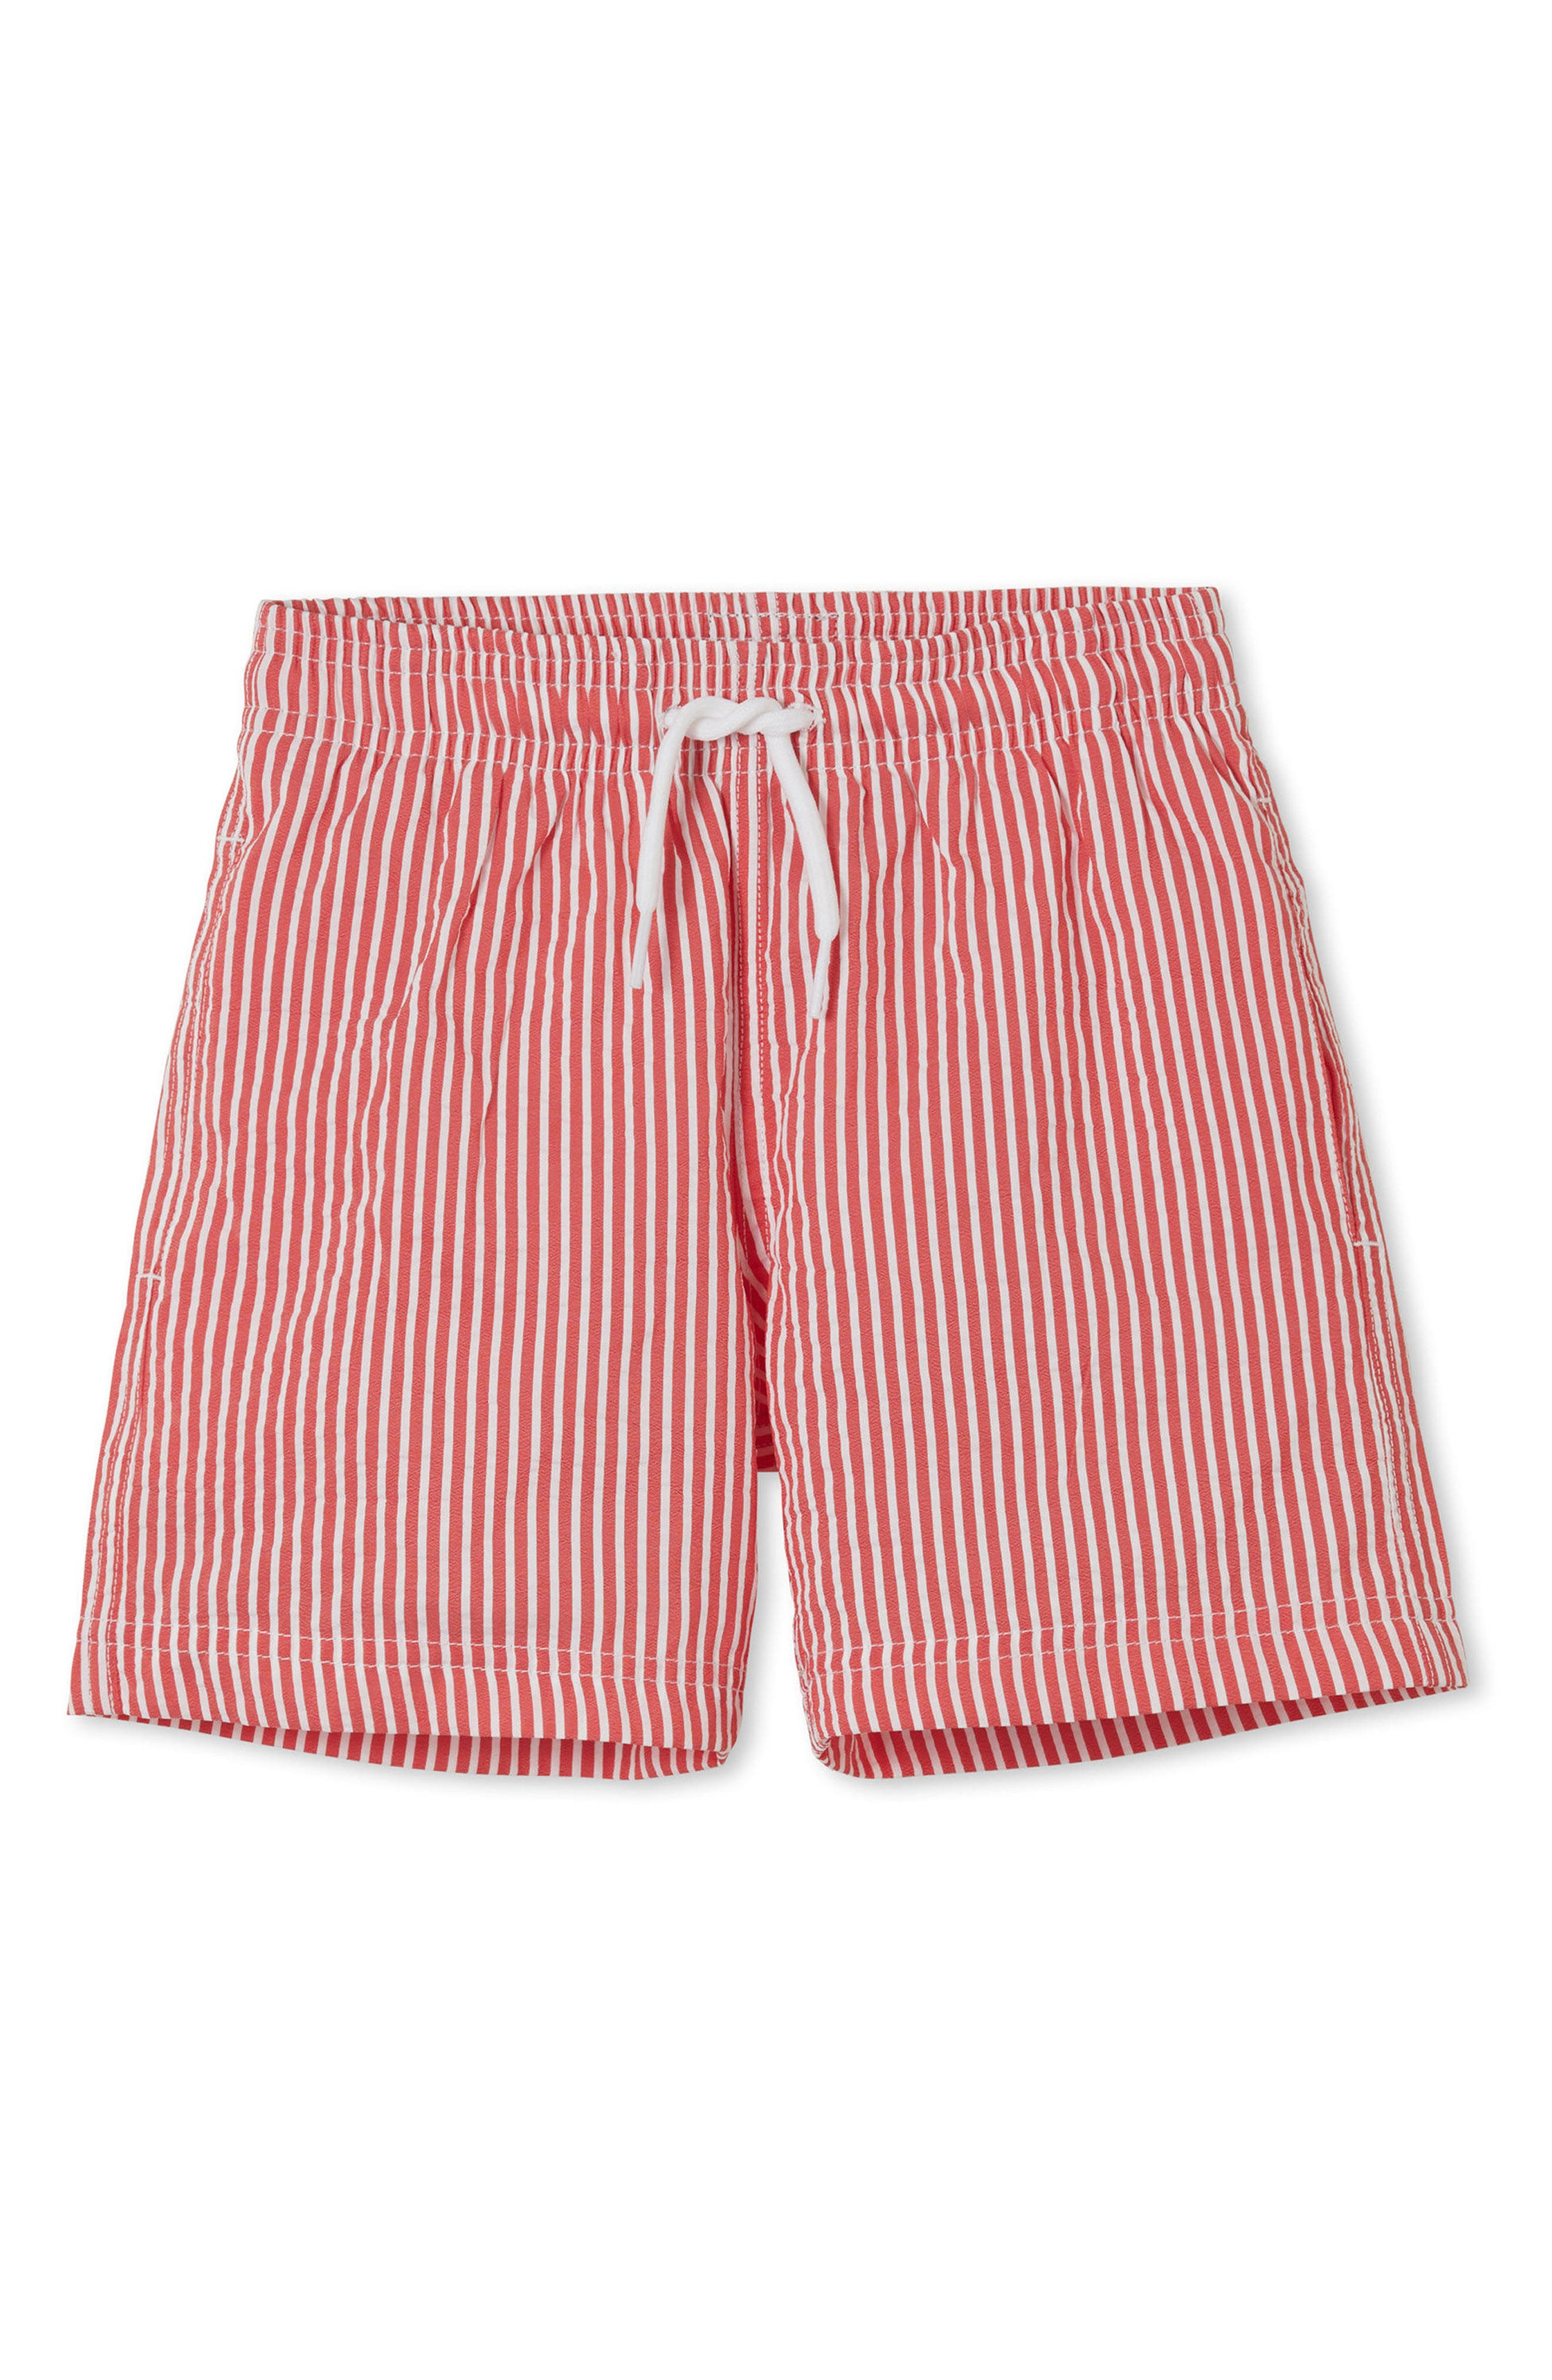 Red Stripe Swim Trunks,                             Main thumbnail 1, color,                             600